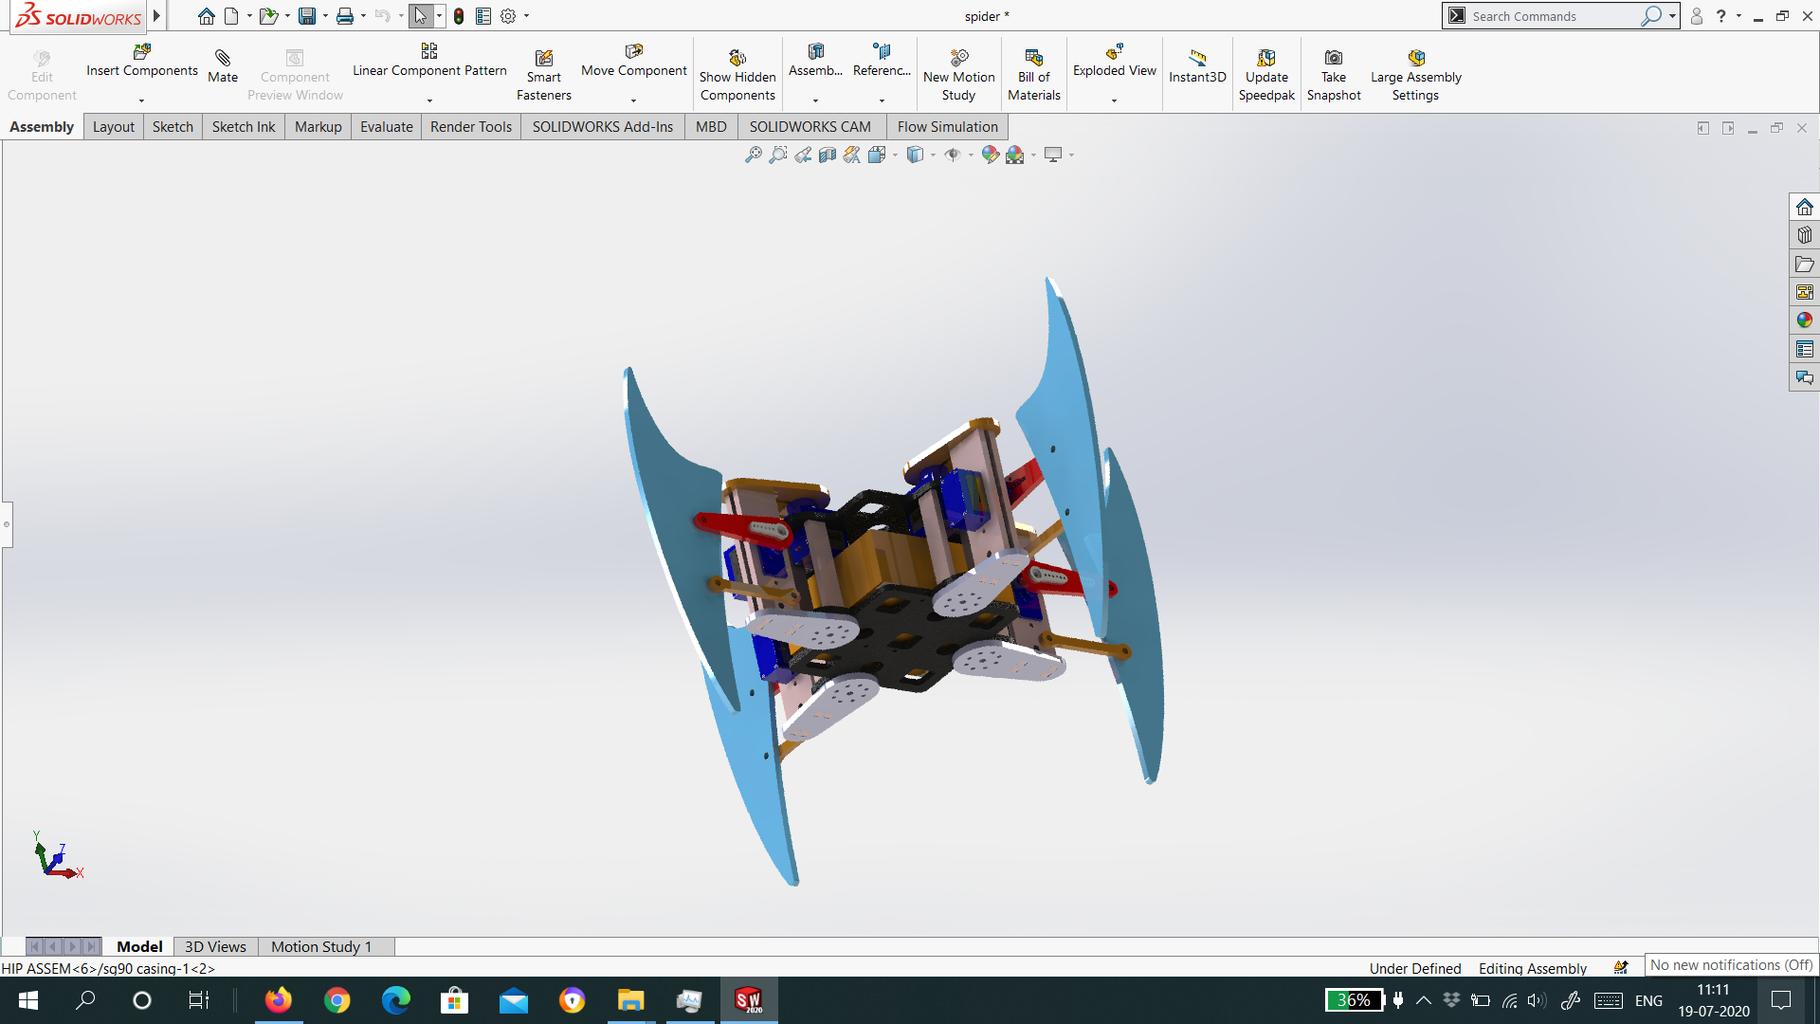 Assembling the Laser Cut Body: